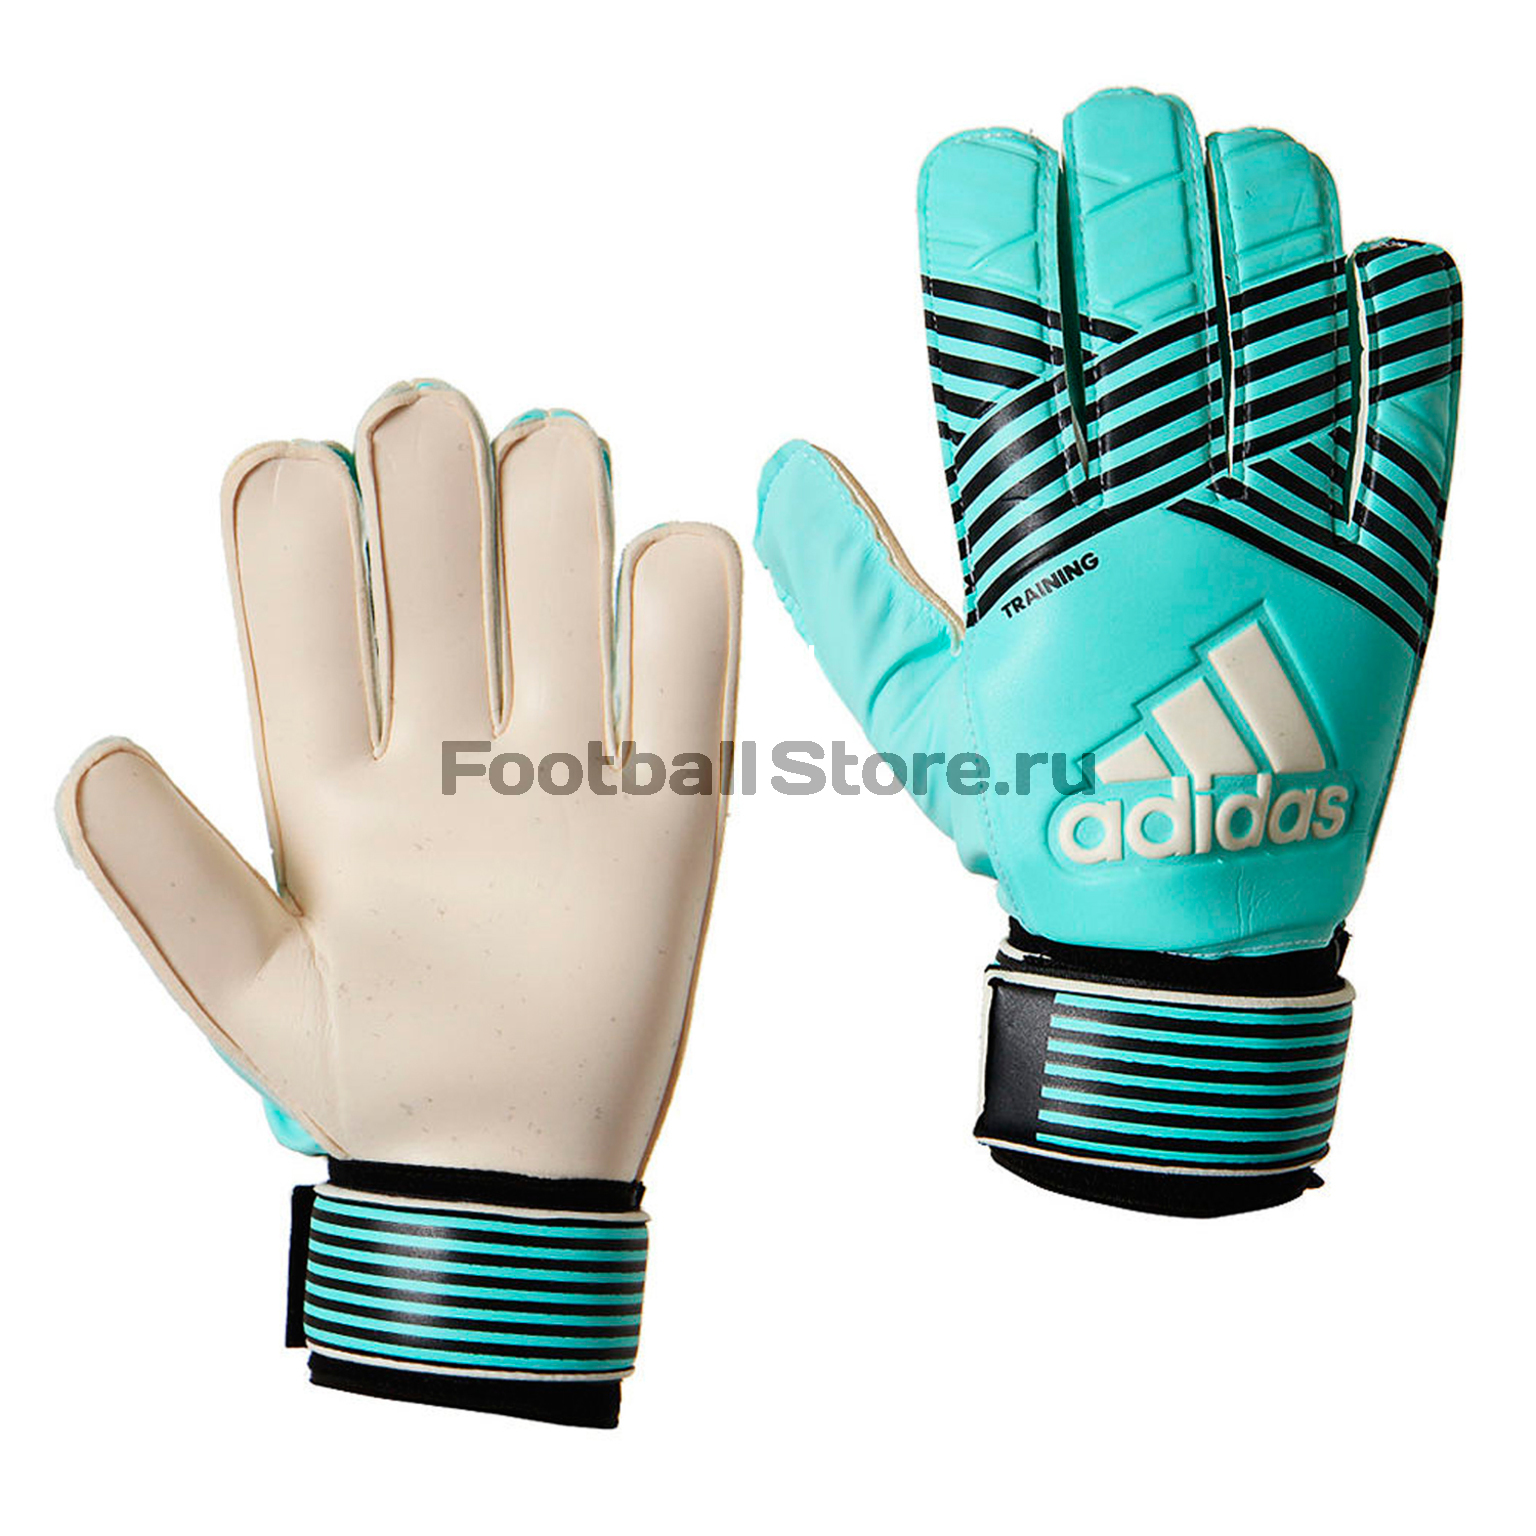 Перчатки вратарские Adidas Ace Training BQ4588 перчатки adidas перчатки adidas ace zones ultim ah7802